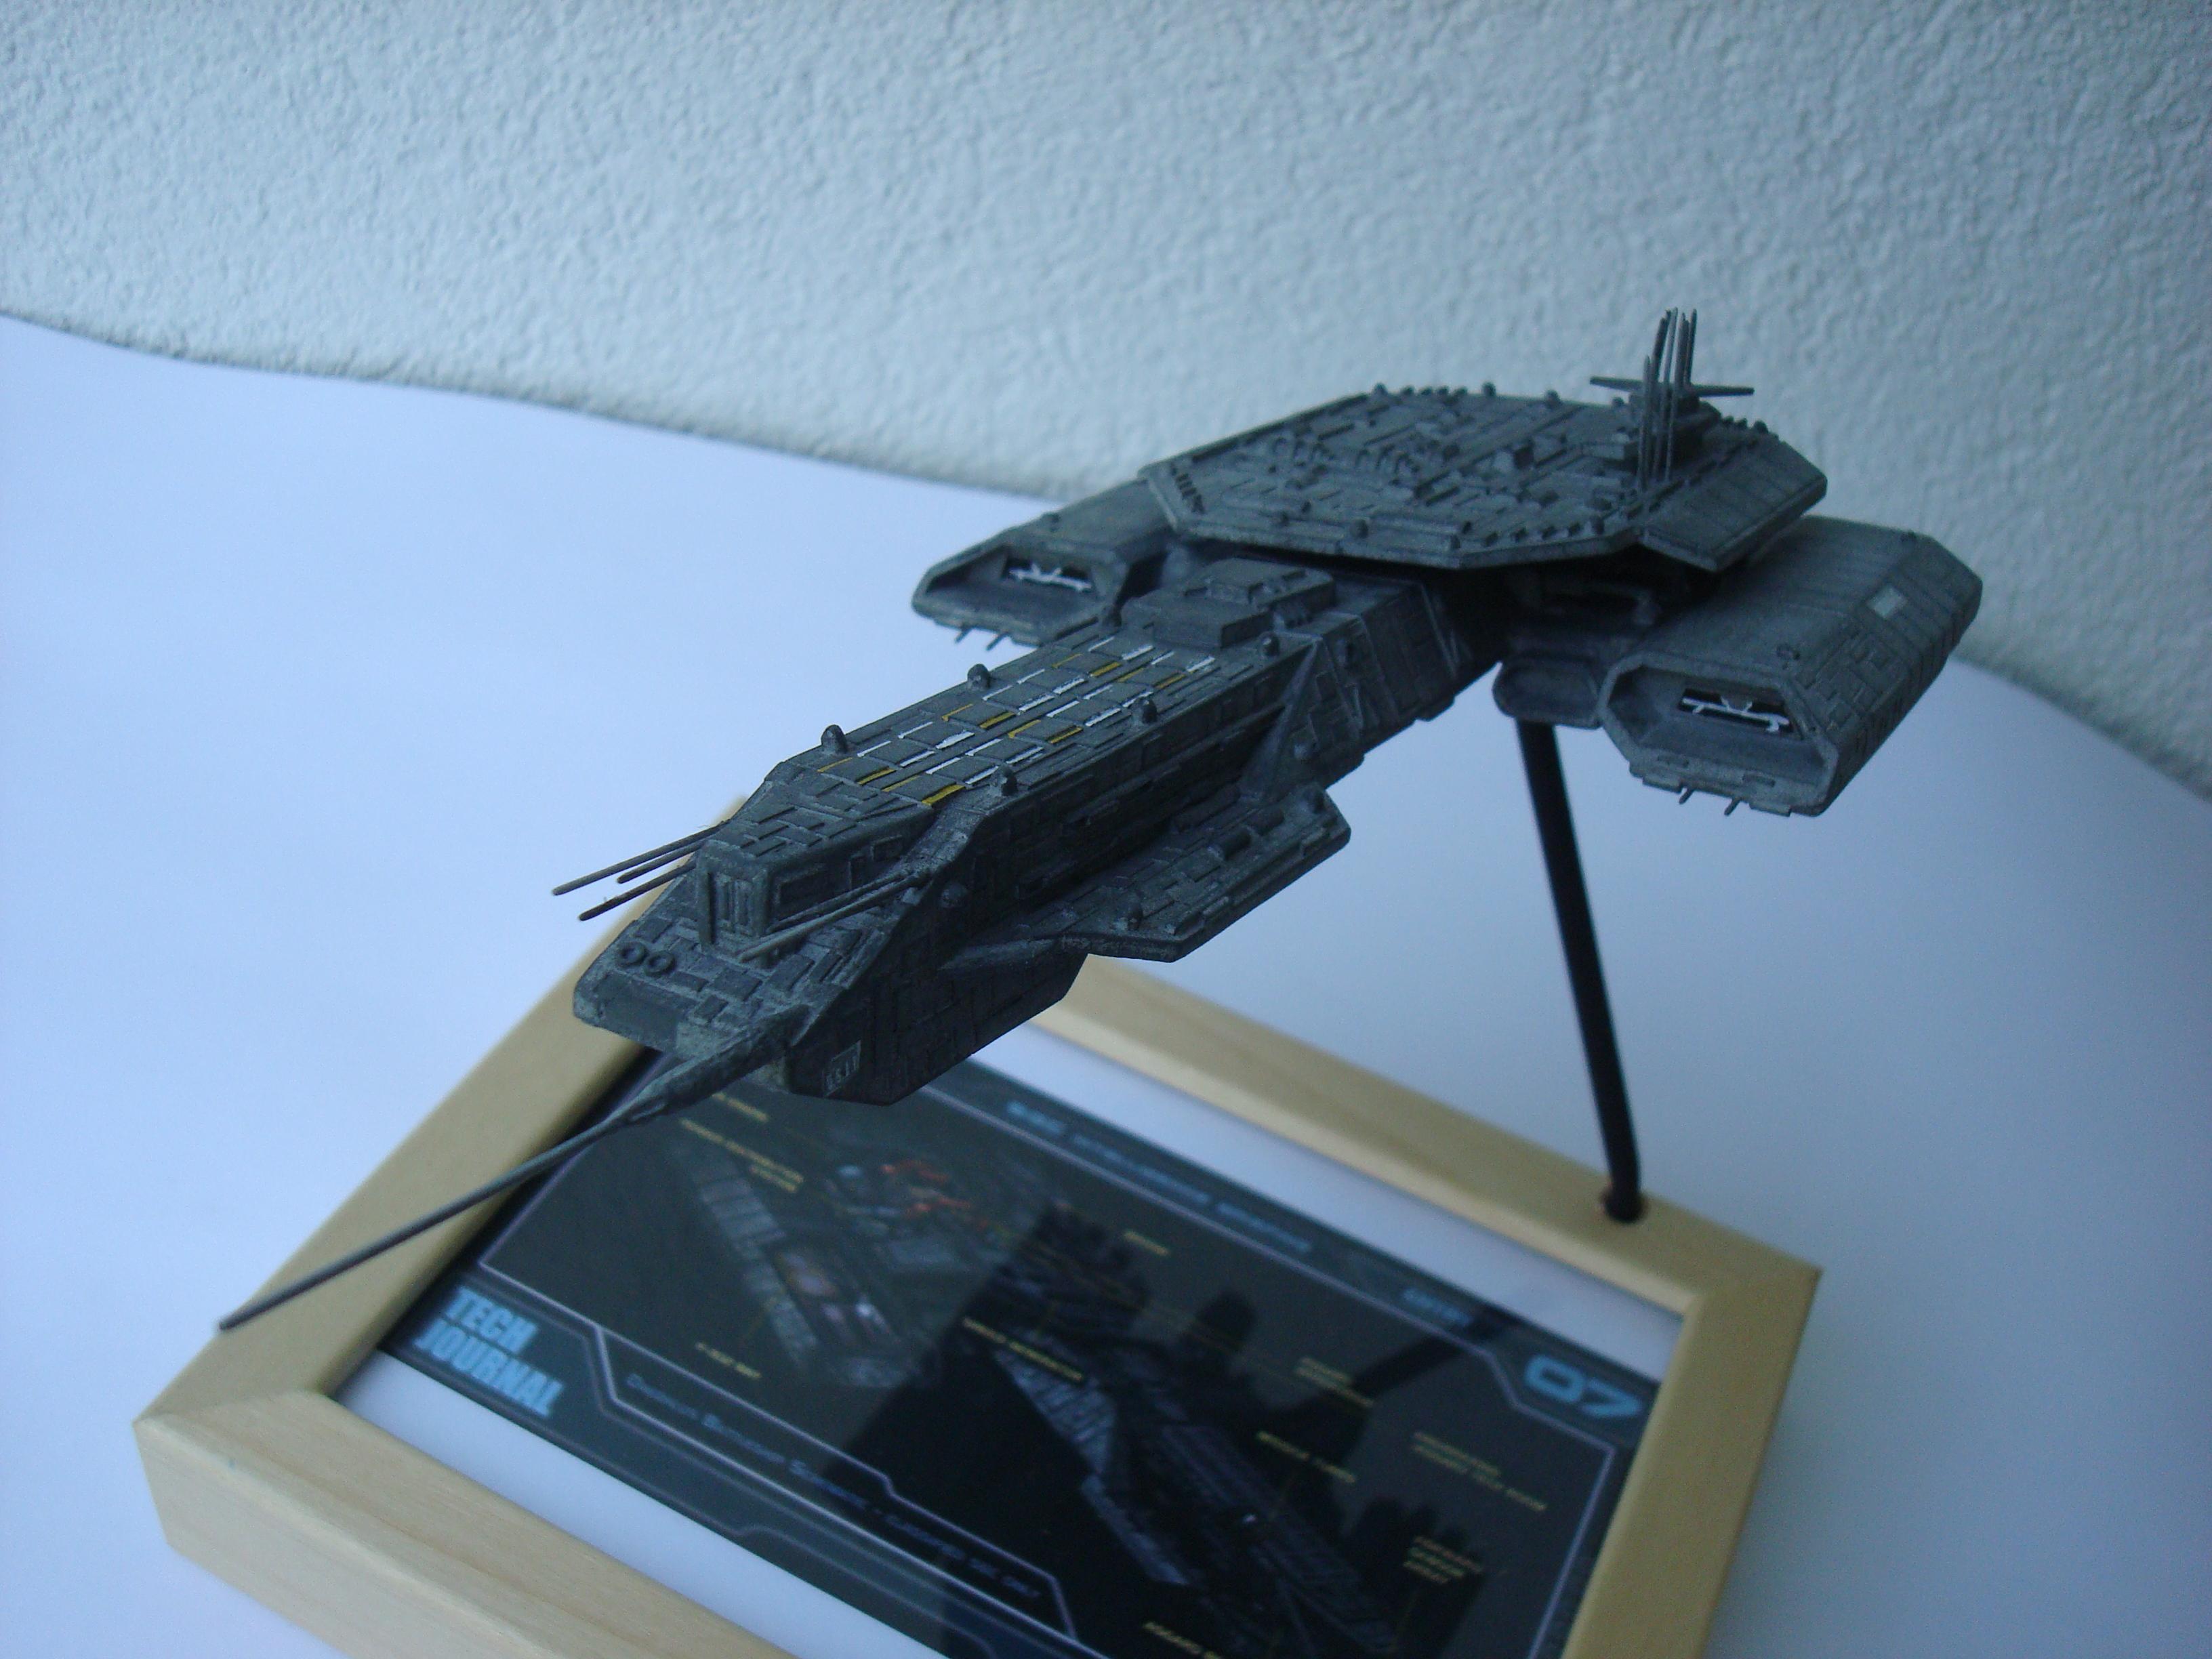 X304-CLASS DEEP SPACE CARRIER DAEDALUS Dsc00609yv